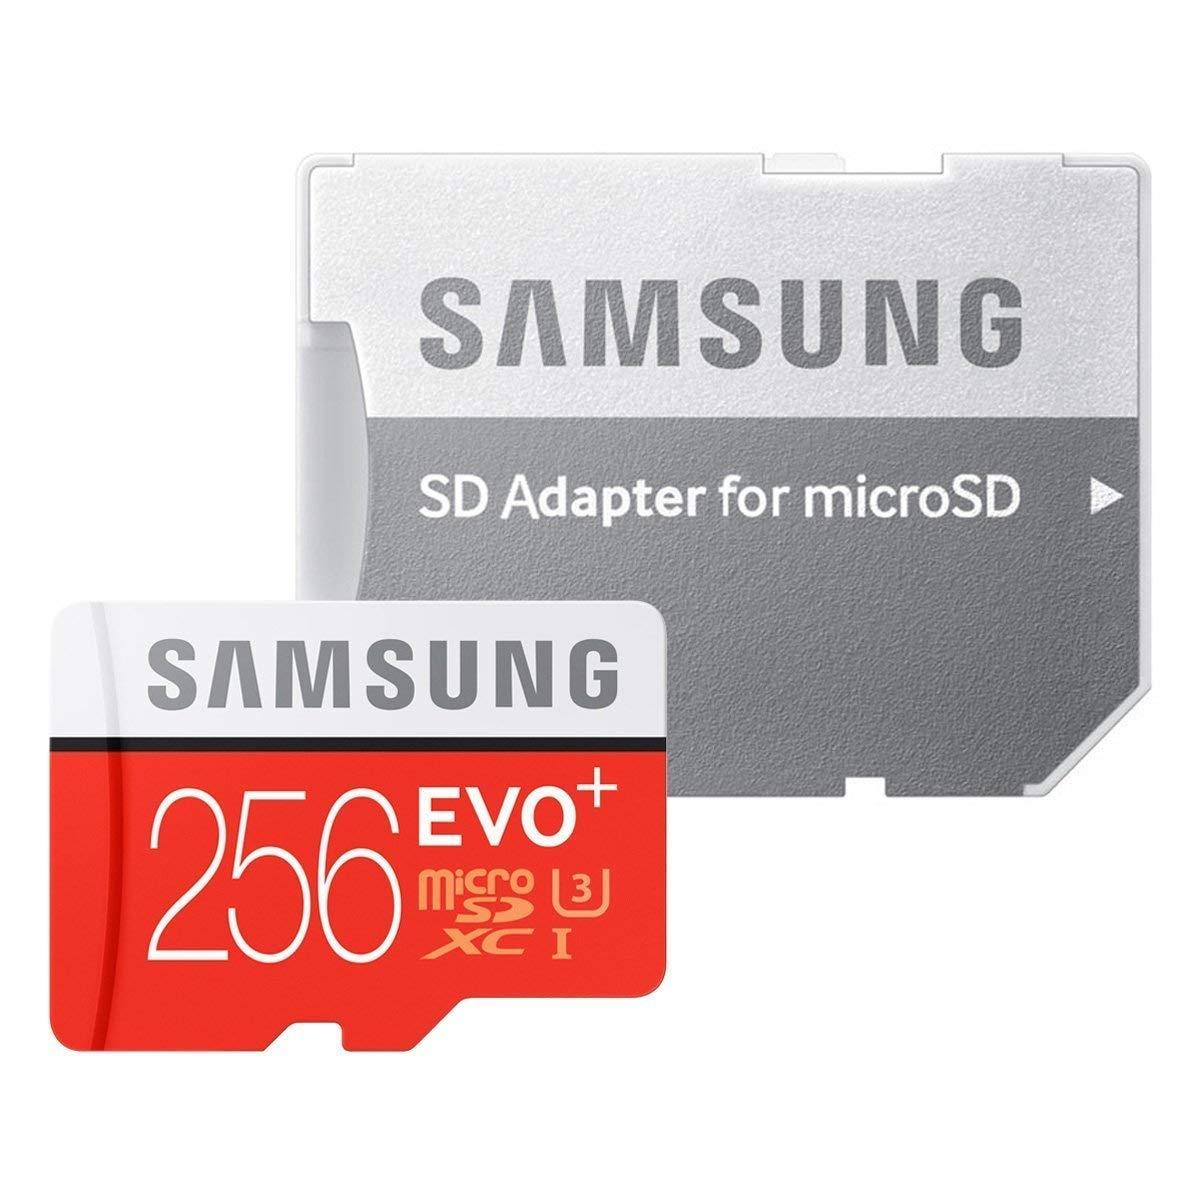 Samsung EVO+ 256GB UHS-I microSDXC U3 Memory Card with Adapter (MB-MC256DA/AM) by Samsung